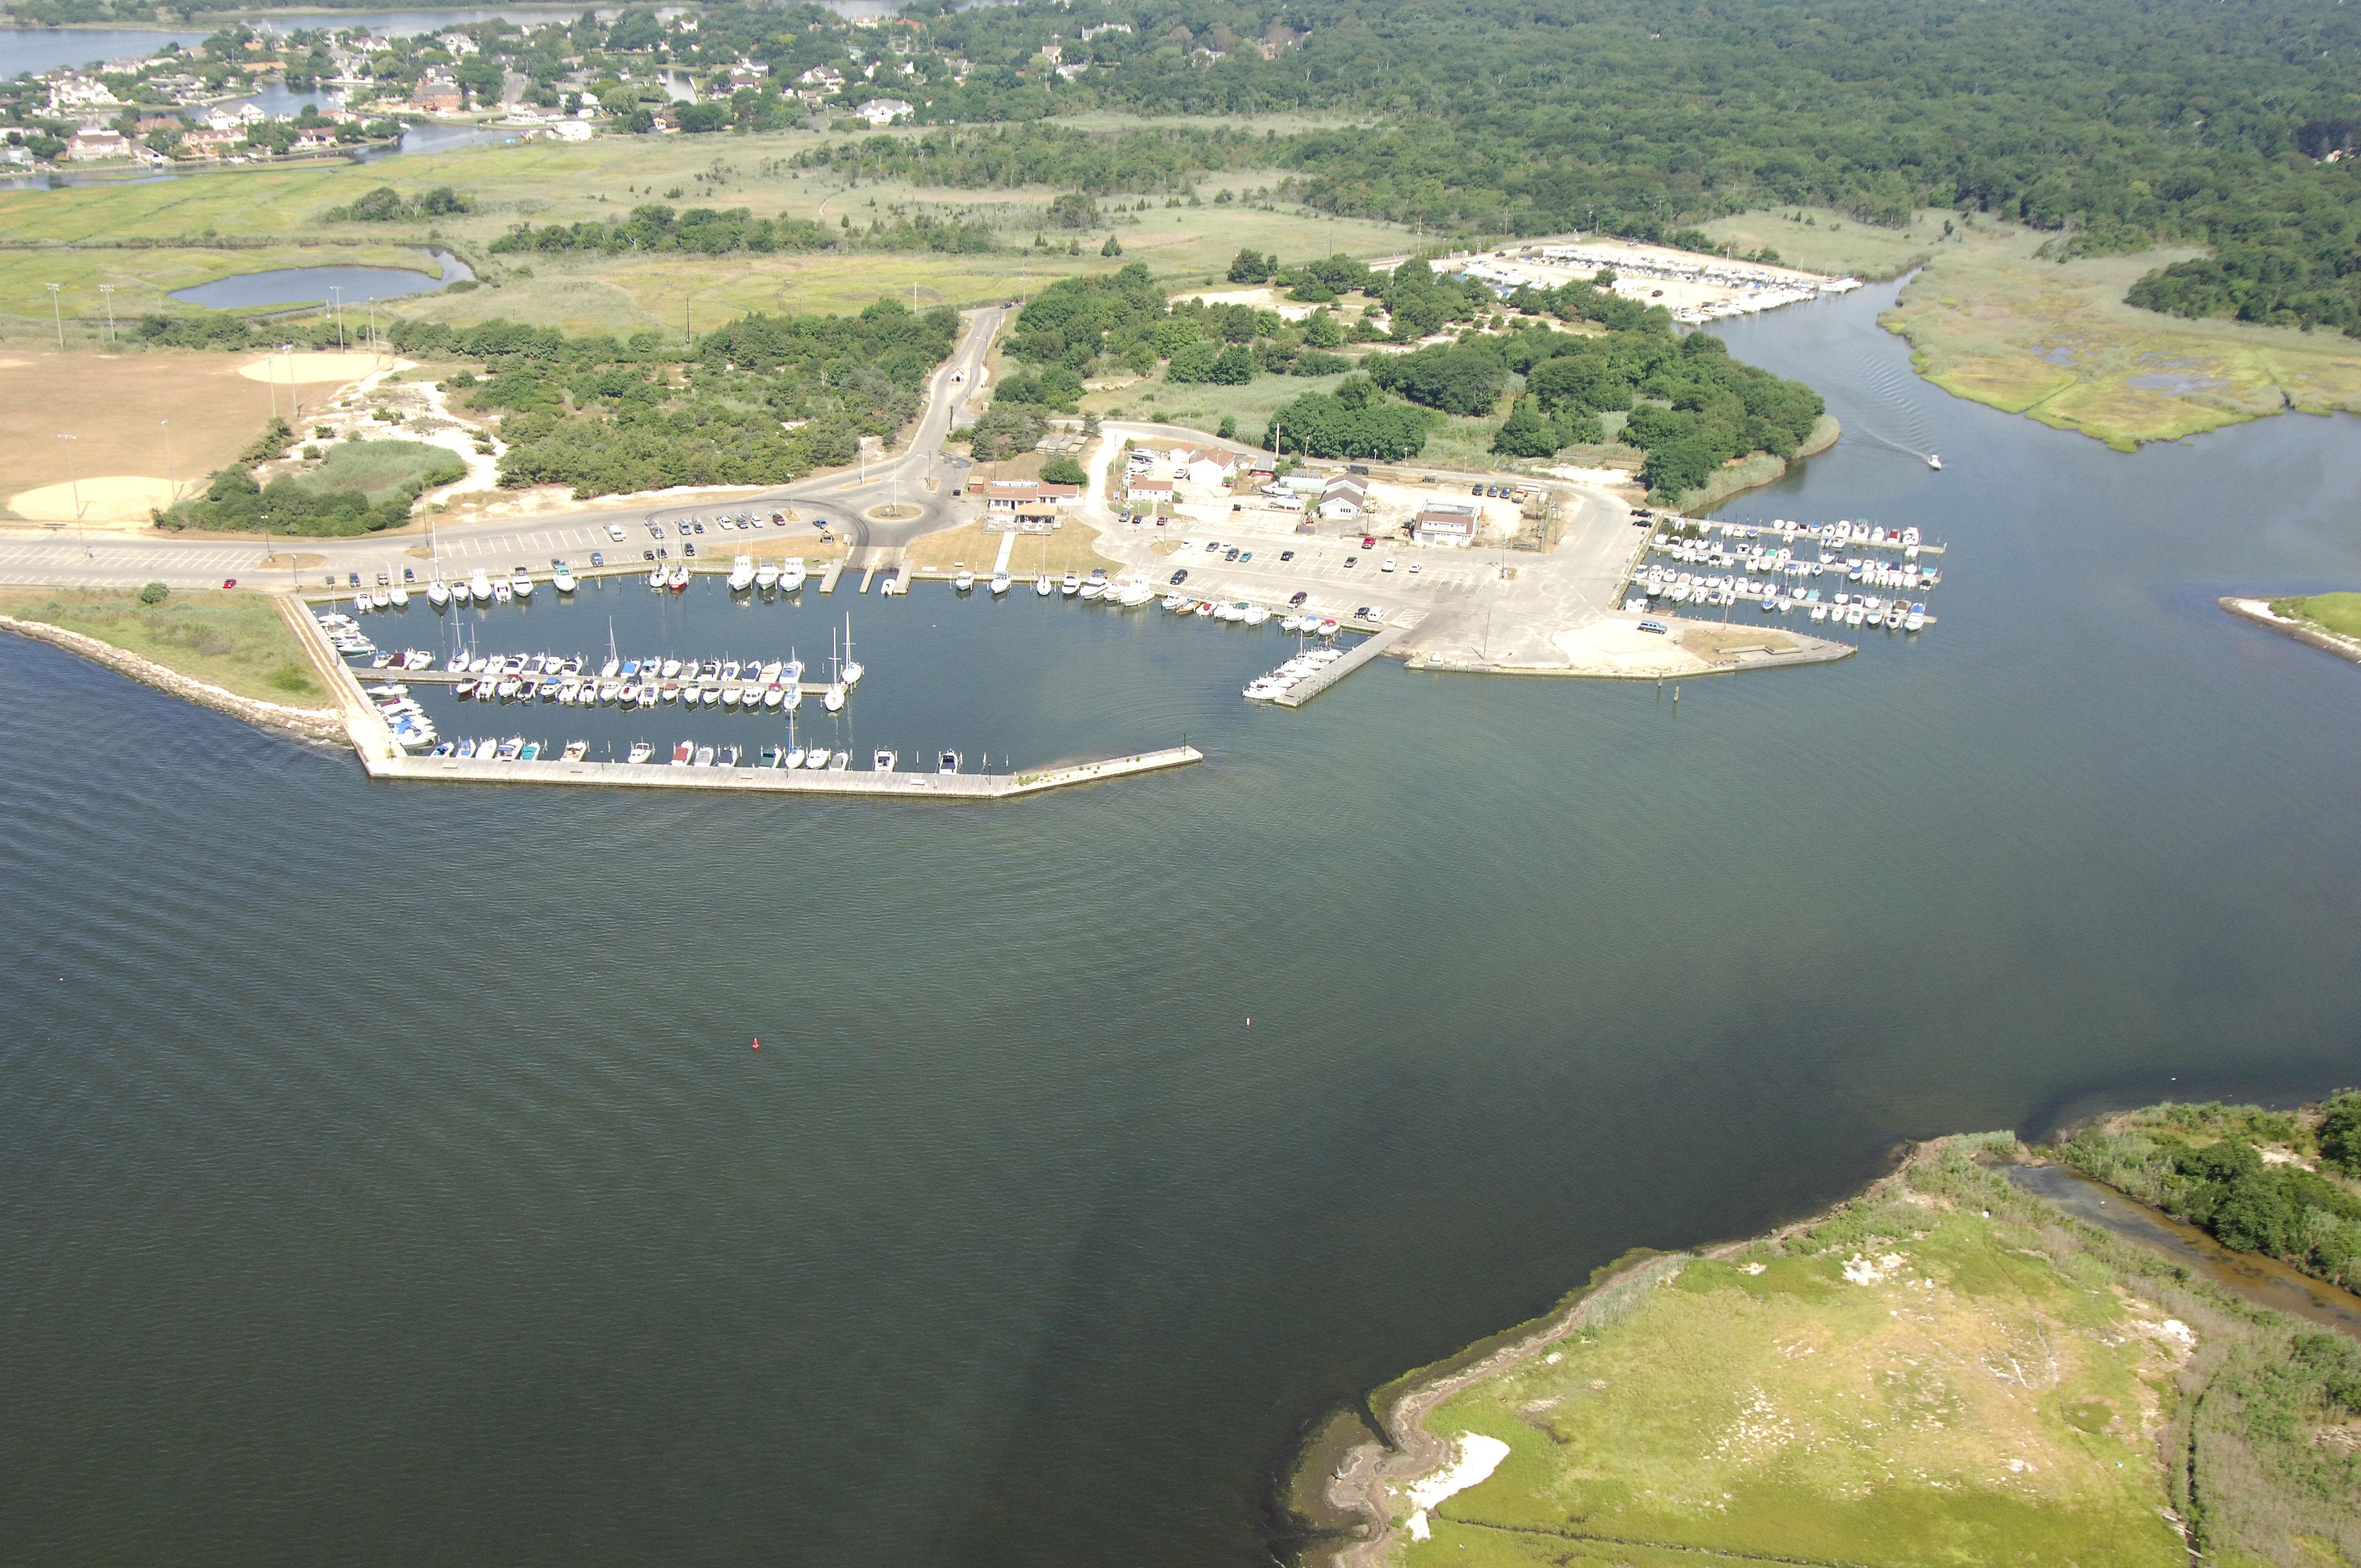 Islip bay marinas docks in east islip ny united states for 7 eleven islip terrace